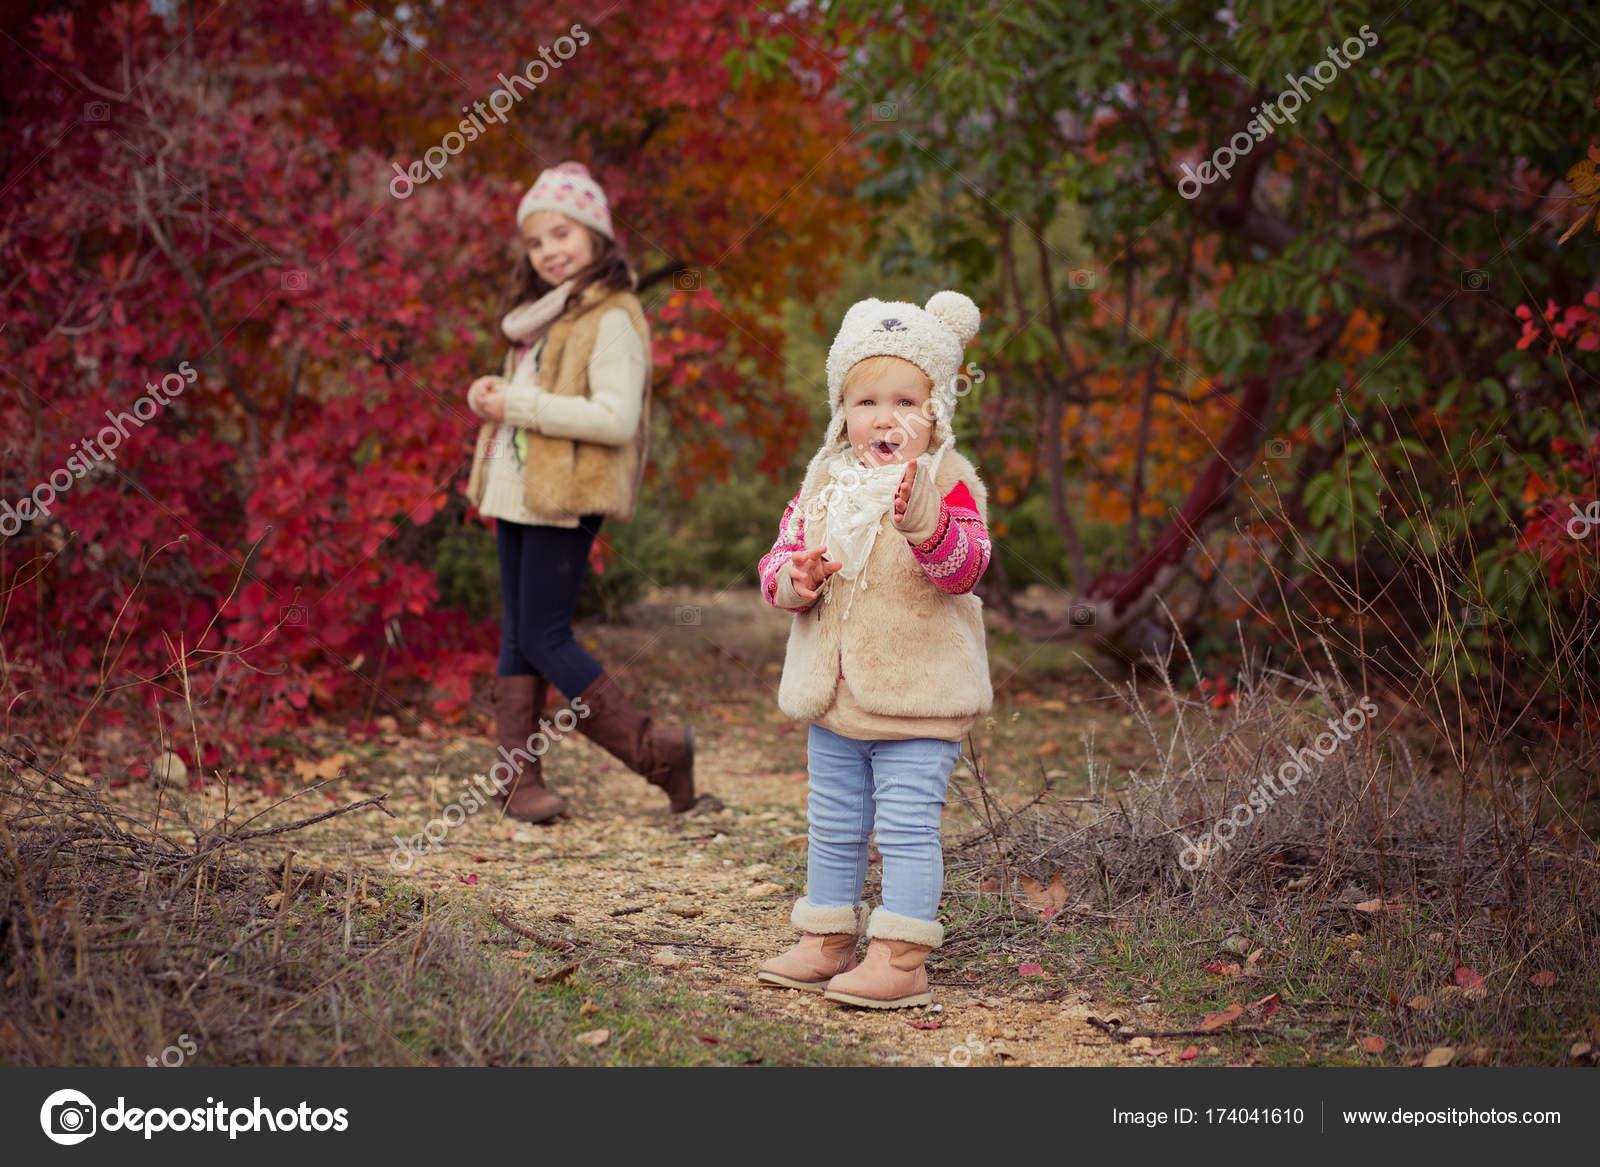 4536406563a Μωρό μόδα κορίτσια αδελφές κομψά ντυμένη brunnette και ξανθιά φορώντας  ζεστό μπουφάν Φθινοπωρινά Ρούχα, ποζάρει